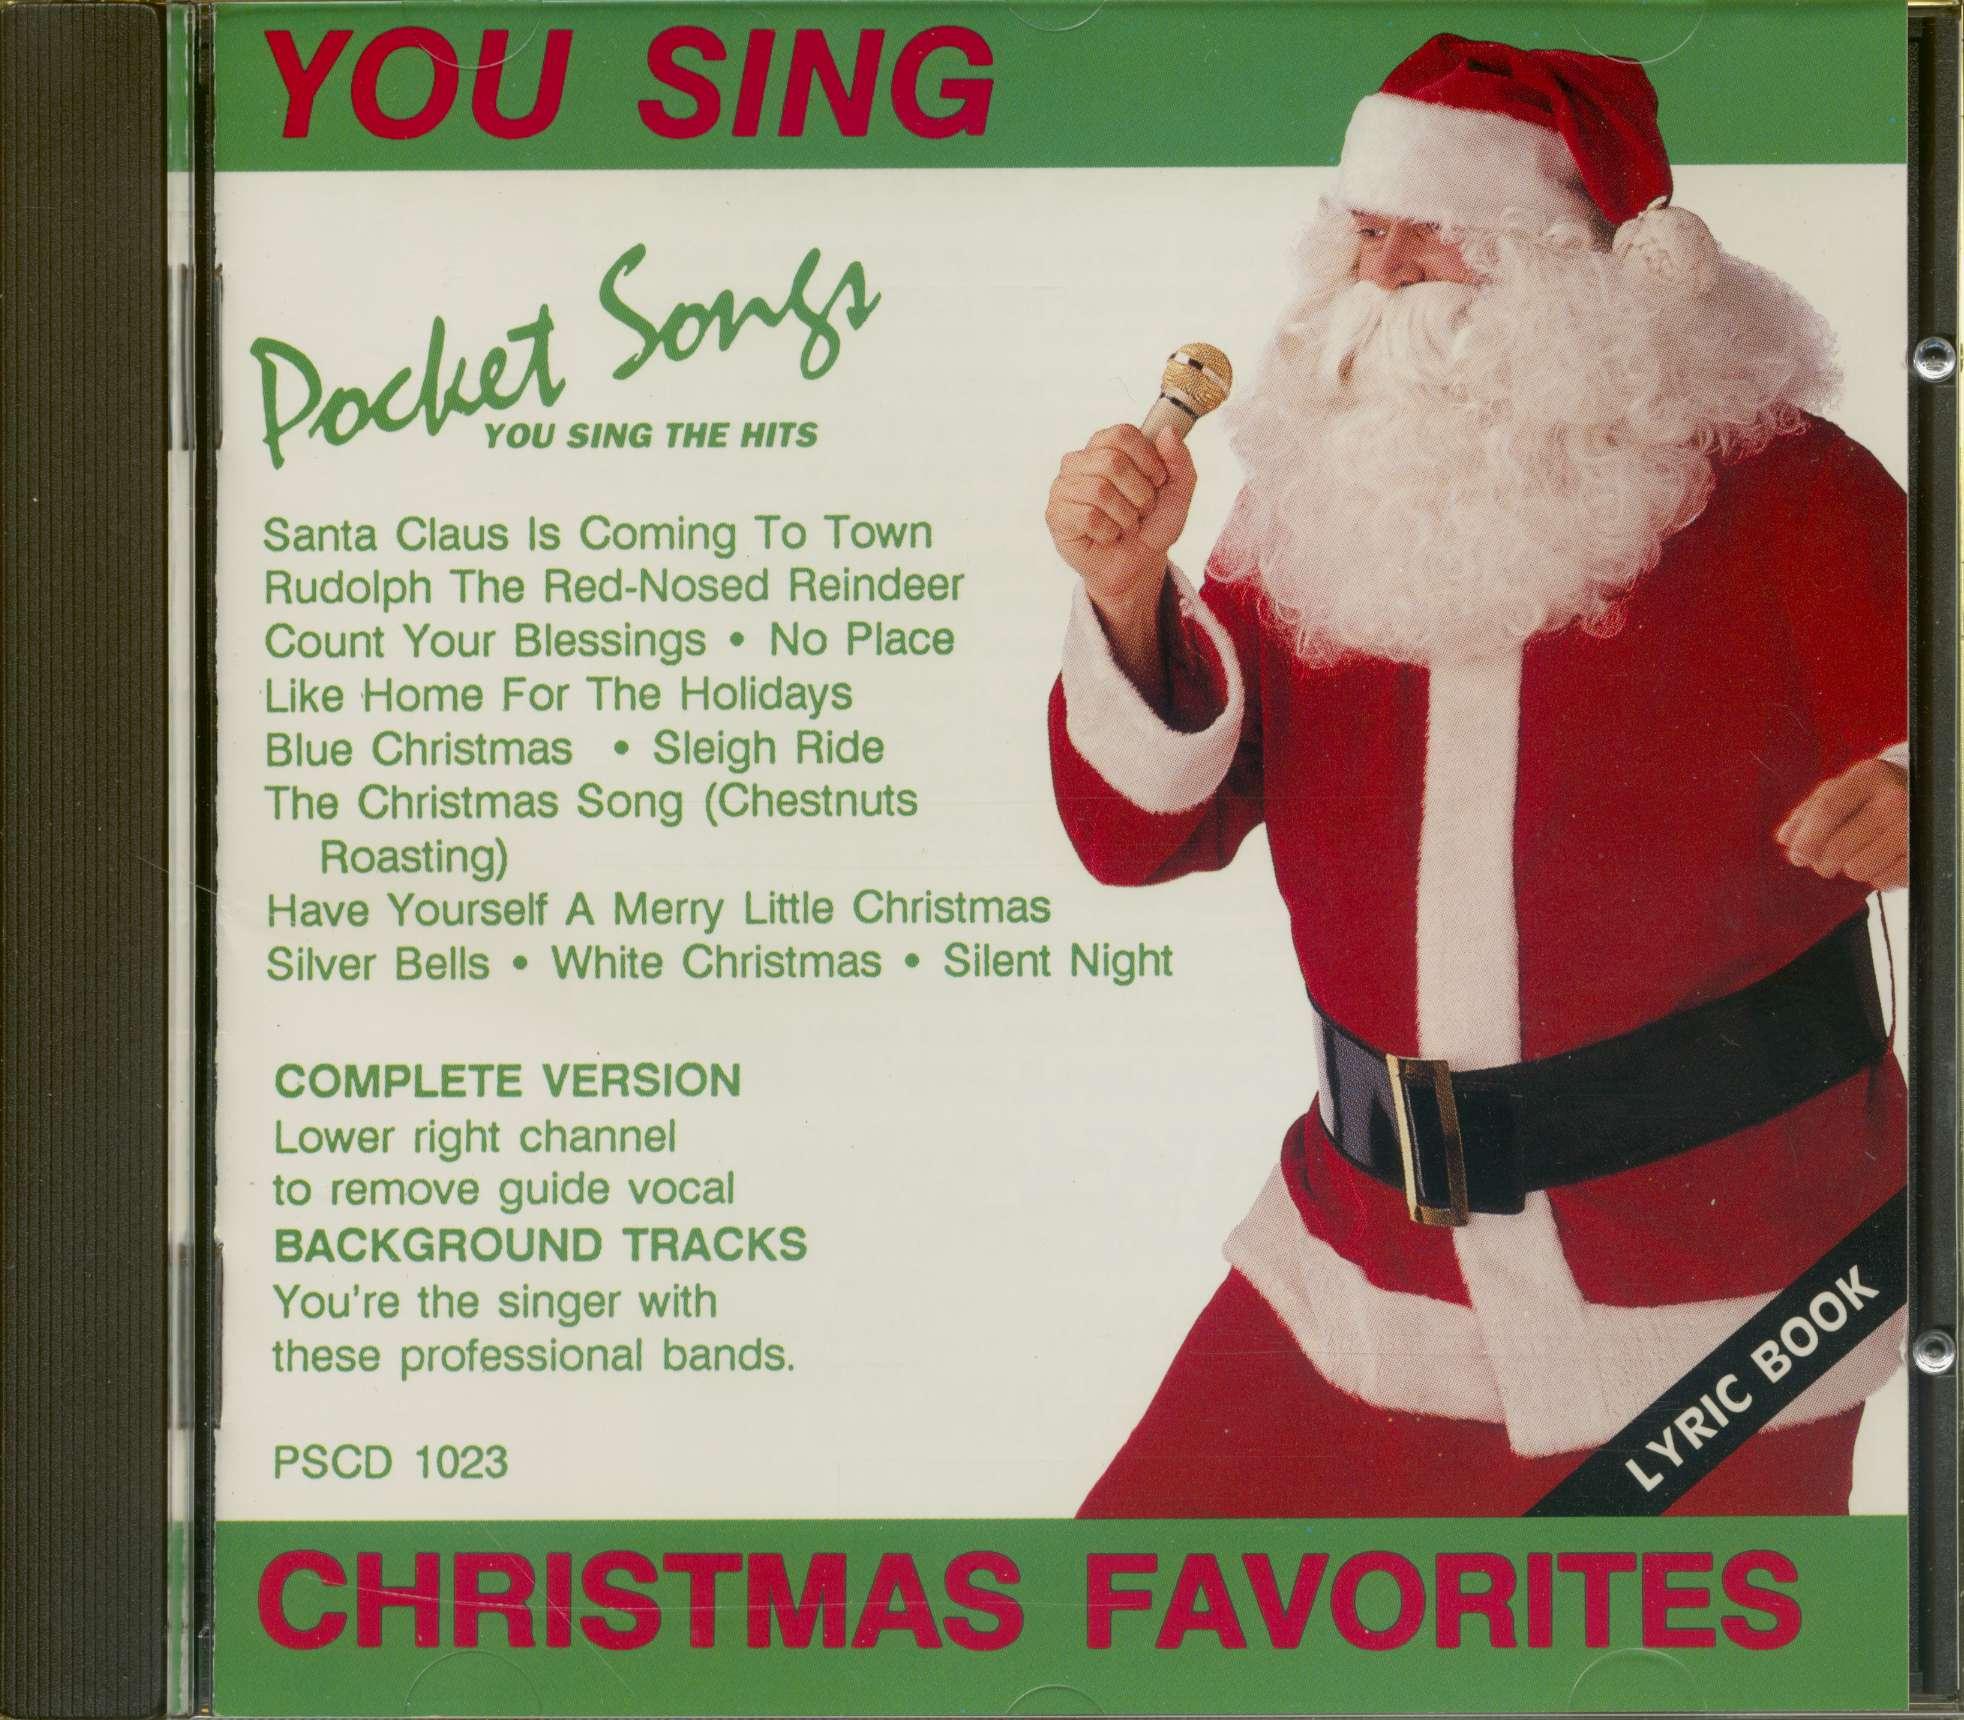 Christmas Karaoke Cd.Various You Sing Christmas Favorites Karaoke Cd